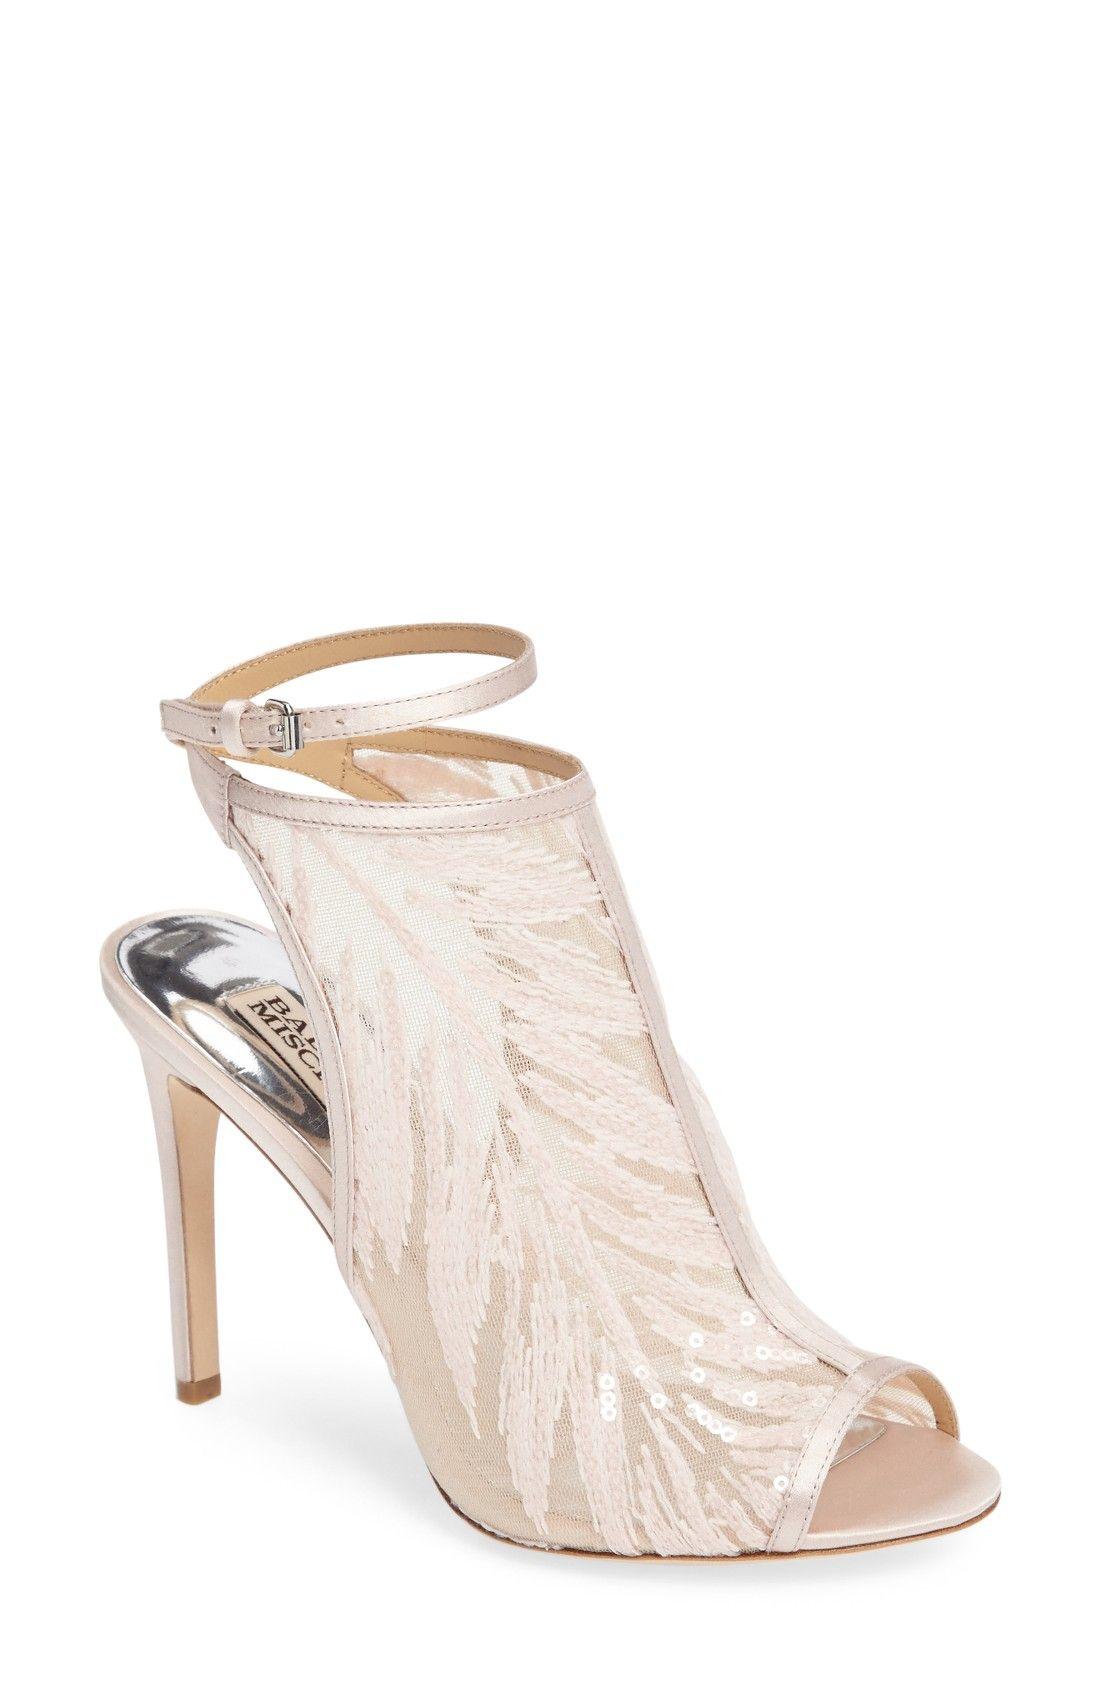 2f0fe1f8091 60 Stylish Bridal Shoes